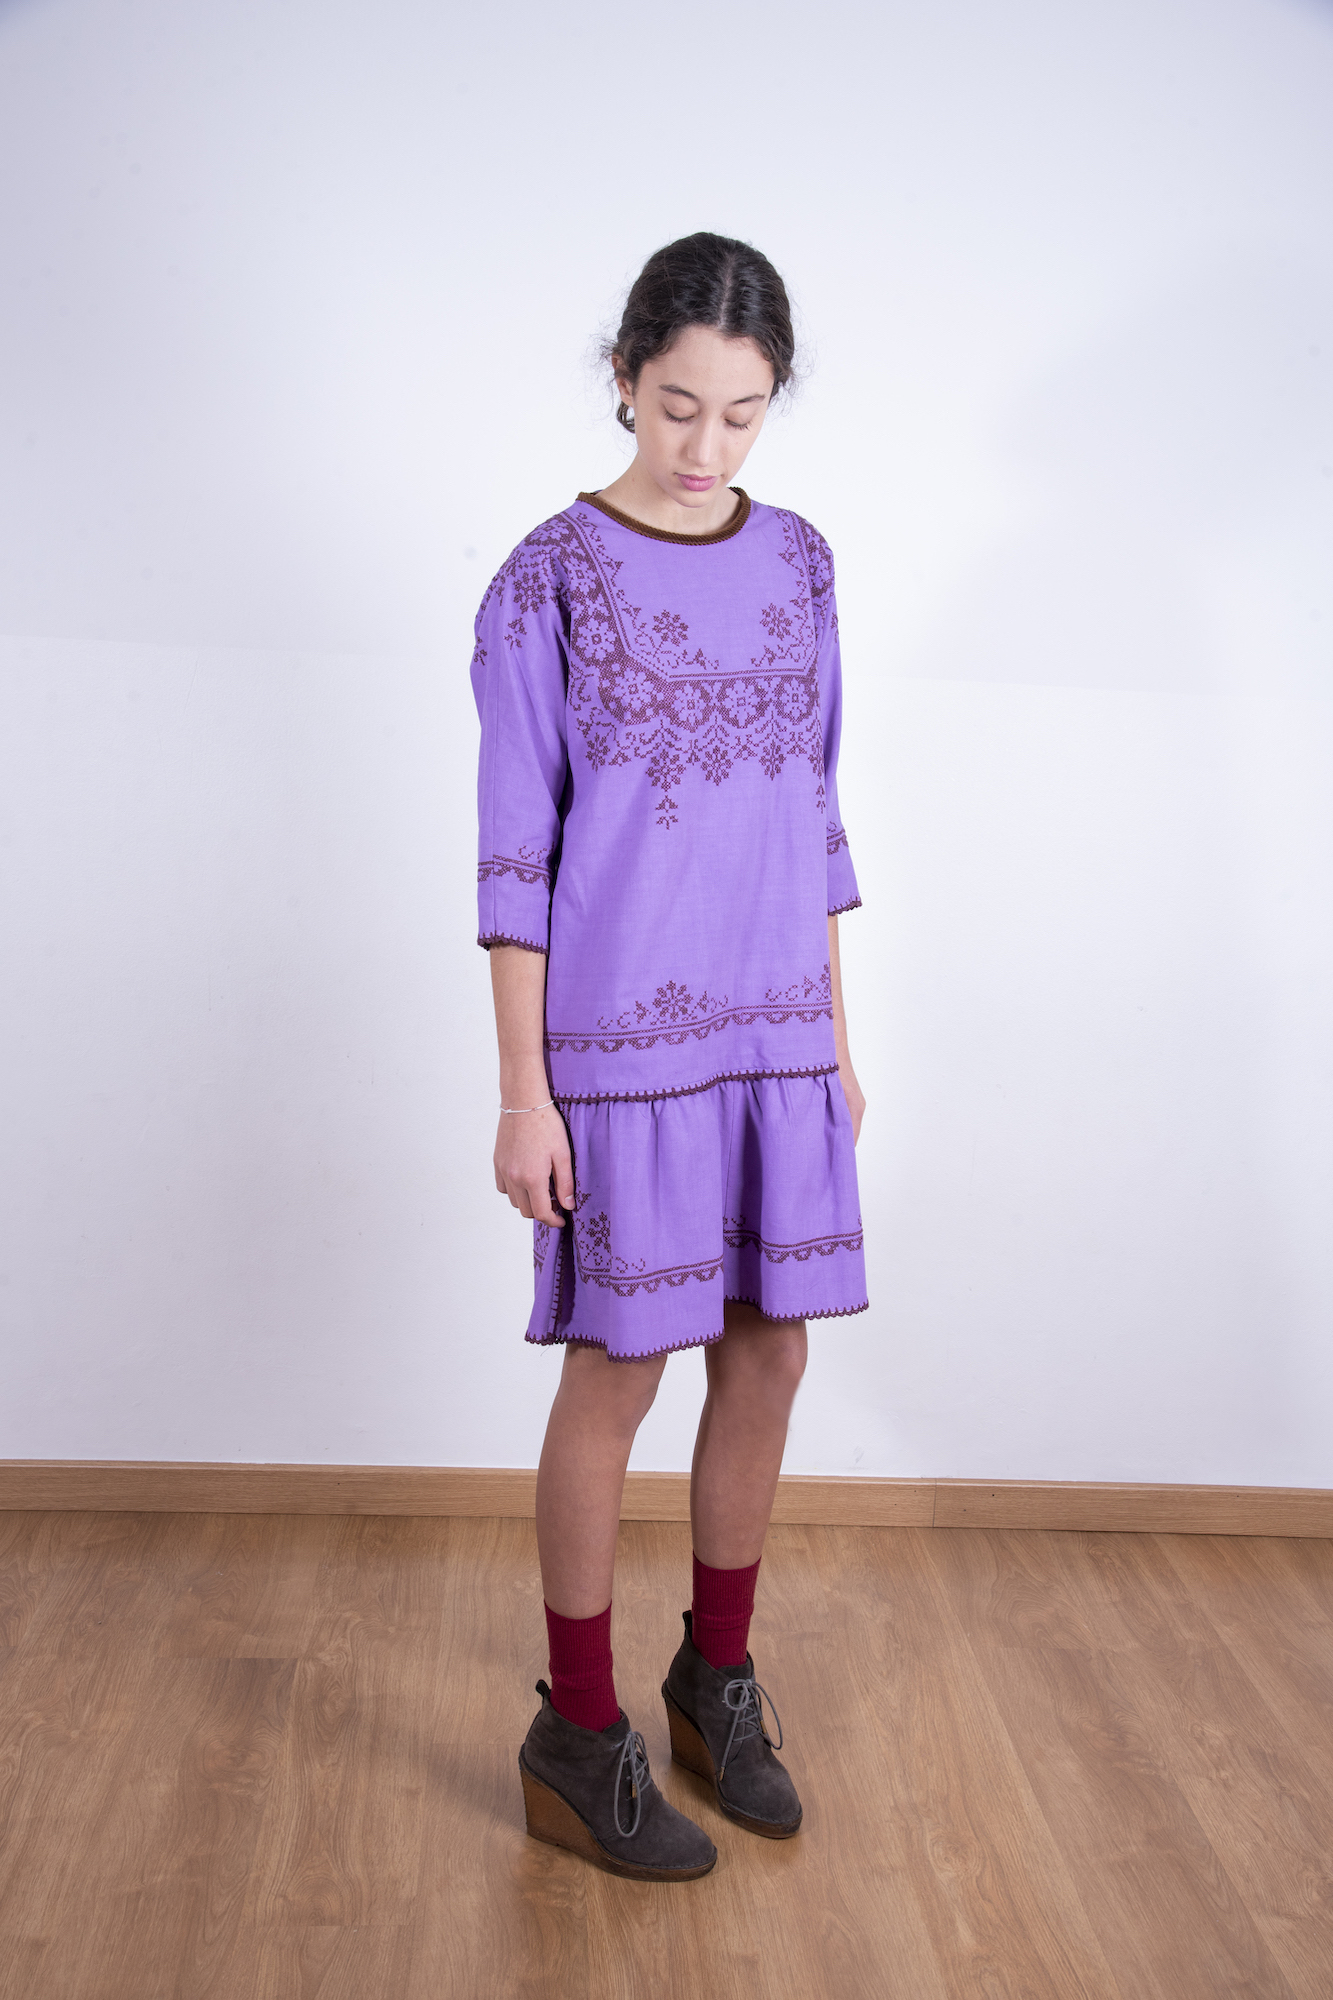 Purple embroidered flounce dress